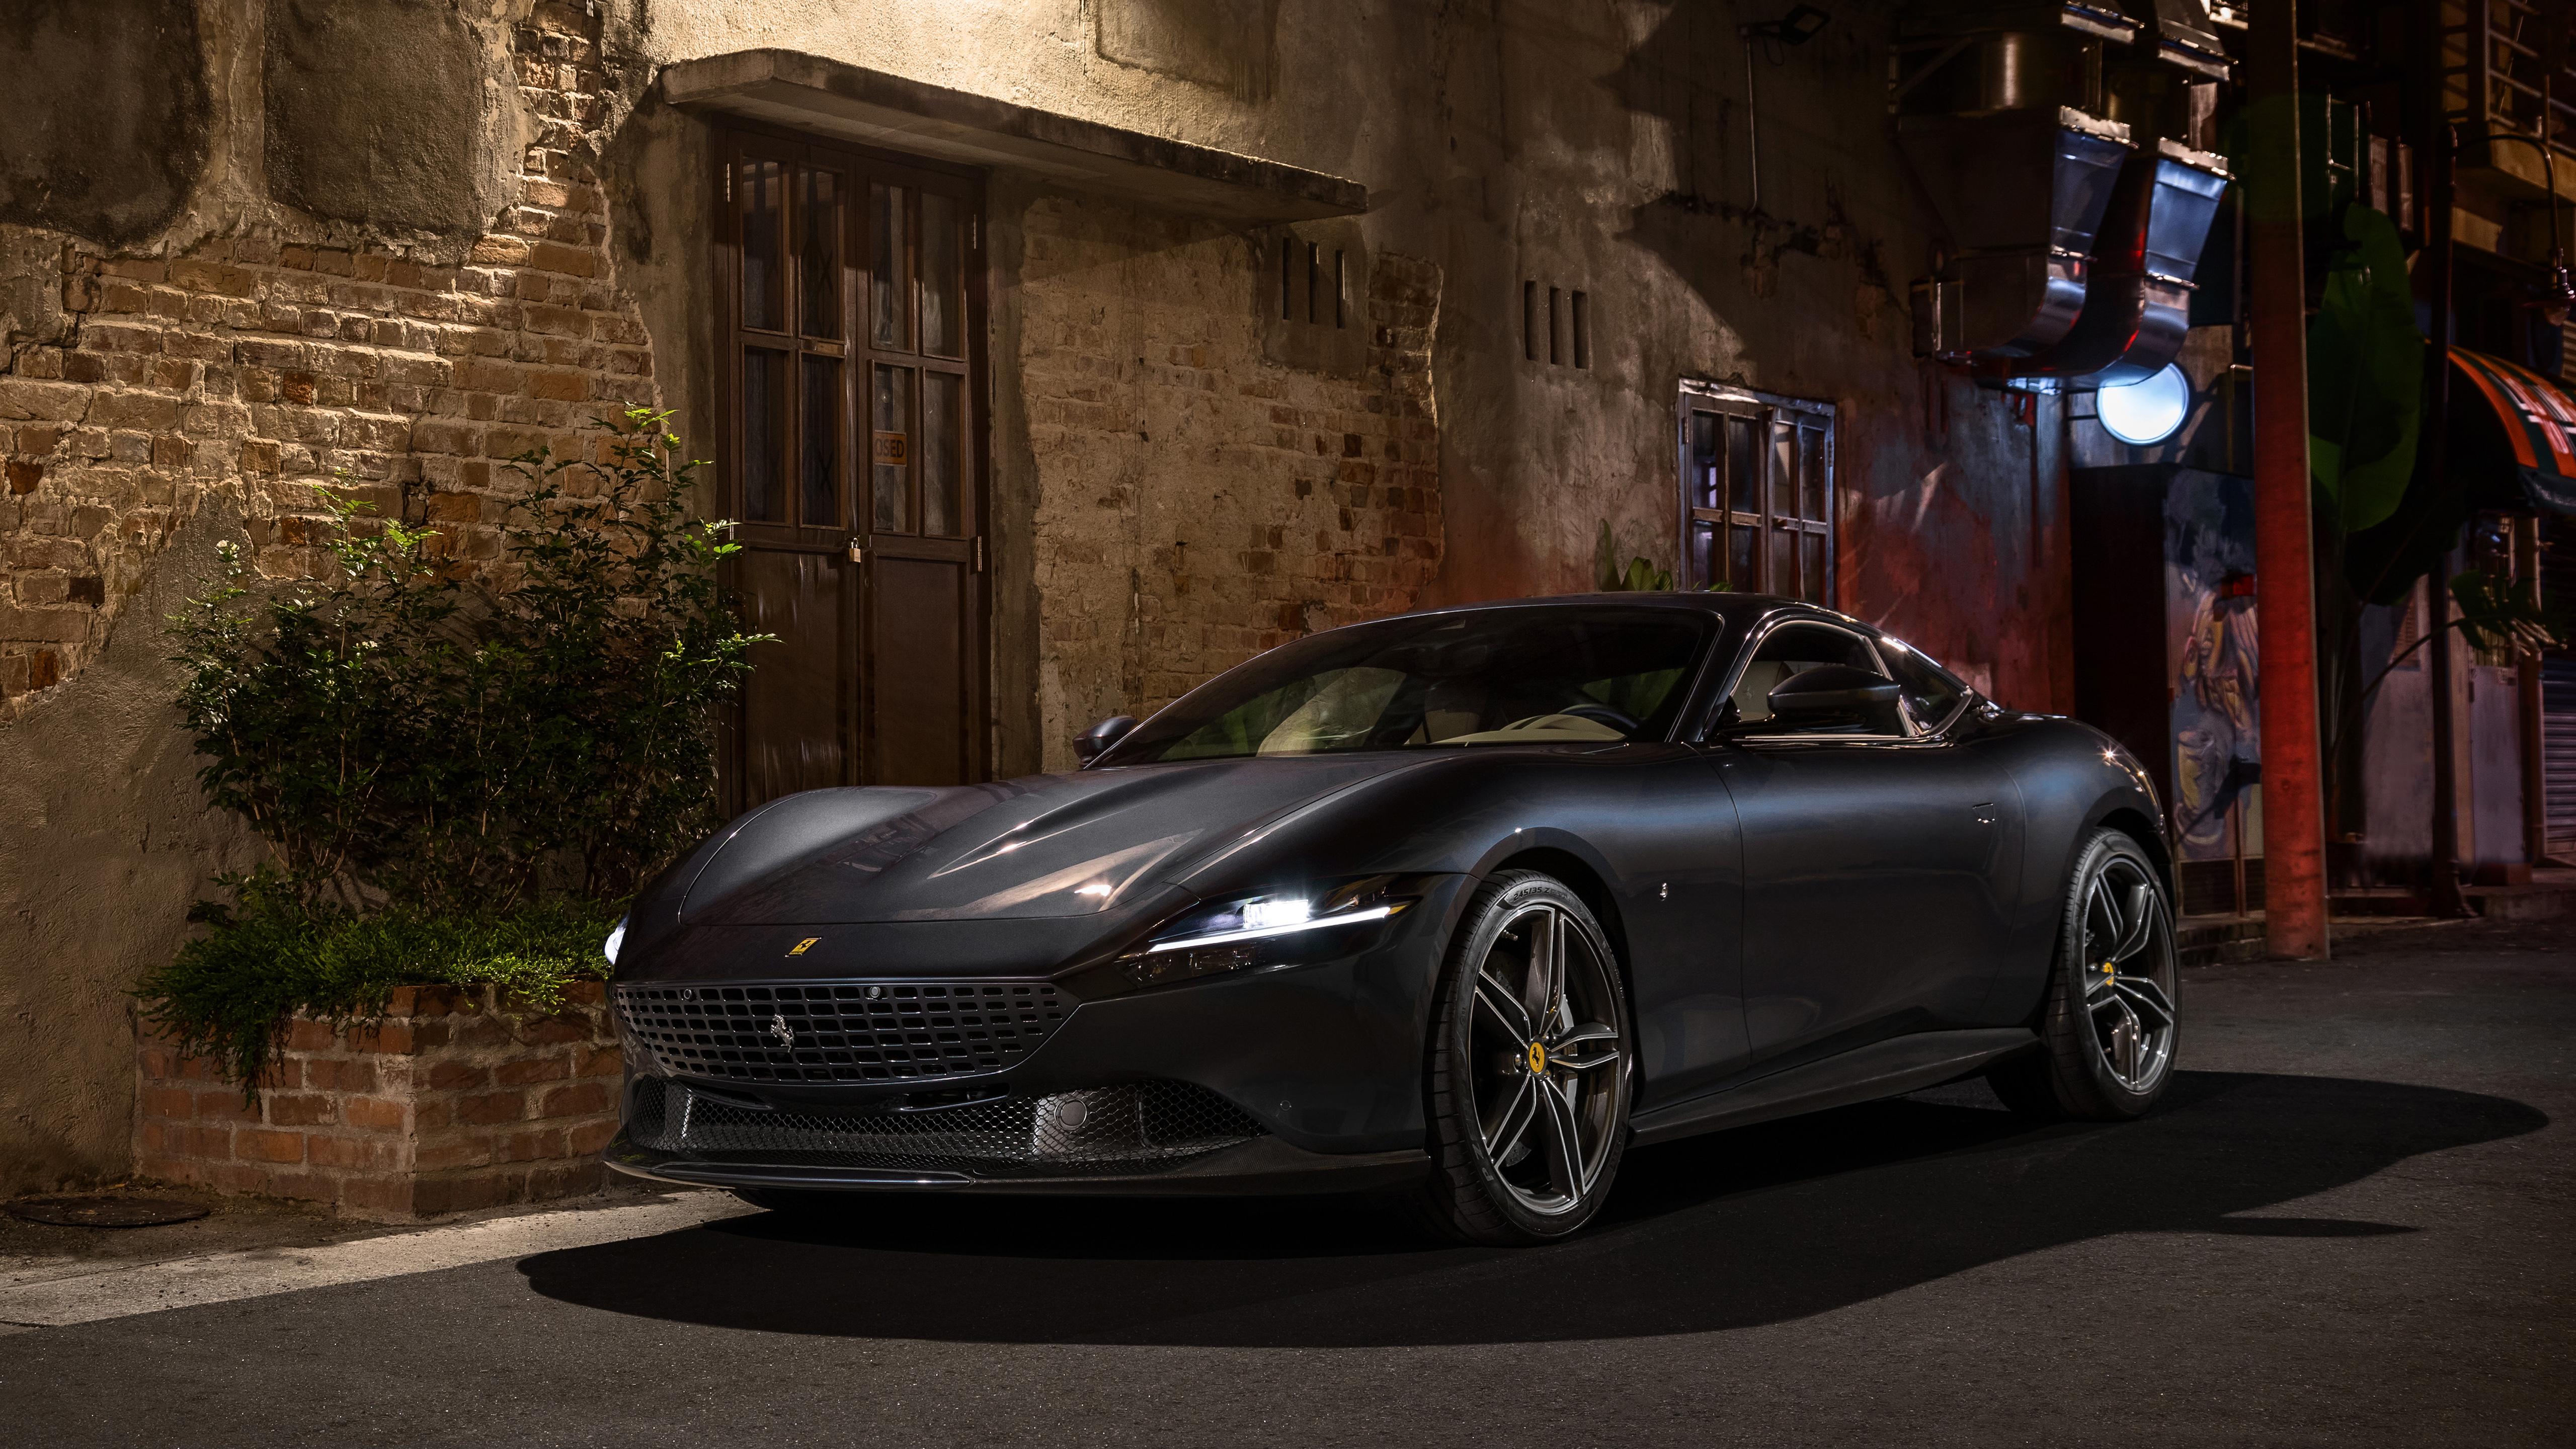 Ferrari Roma 2020 5k Wallpaper Hd Car Wallpapers Id 15140